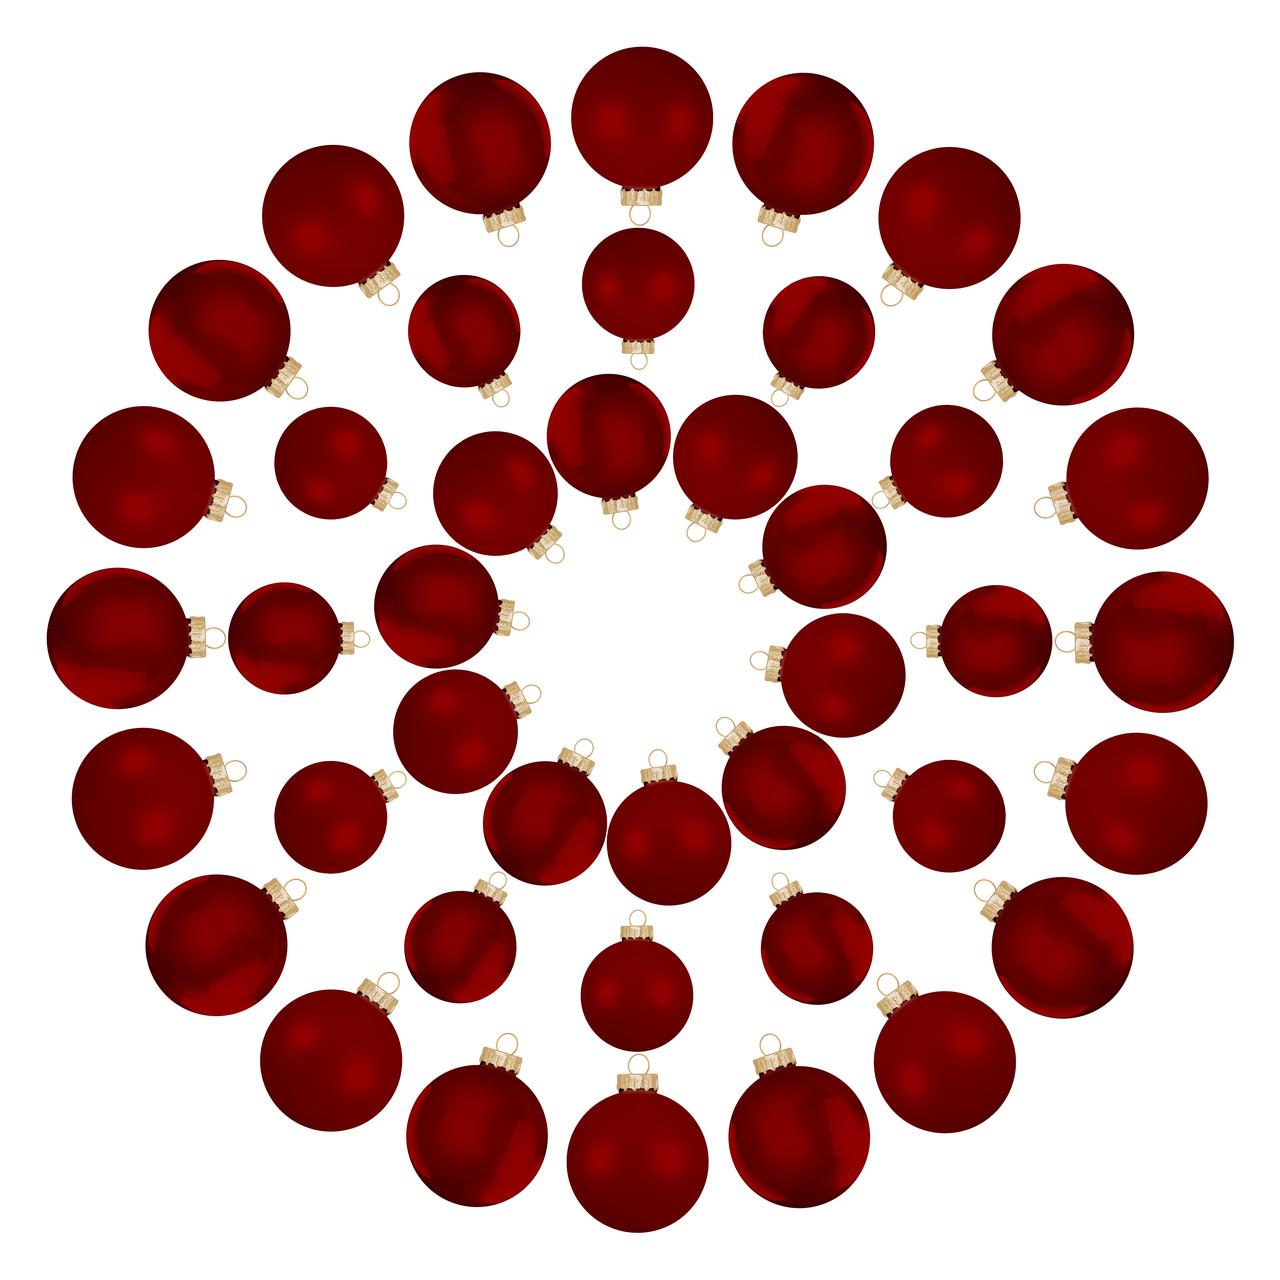 Елочные шары House of Seasons, комплект 42 шт, цвет красный